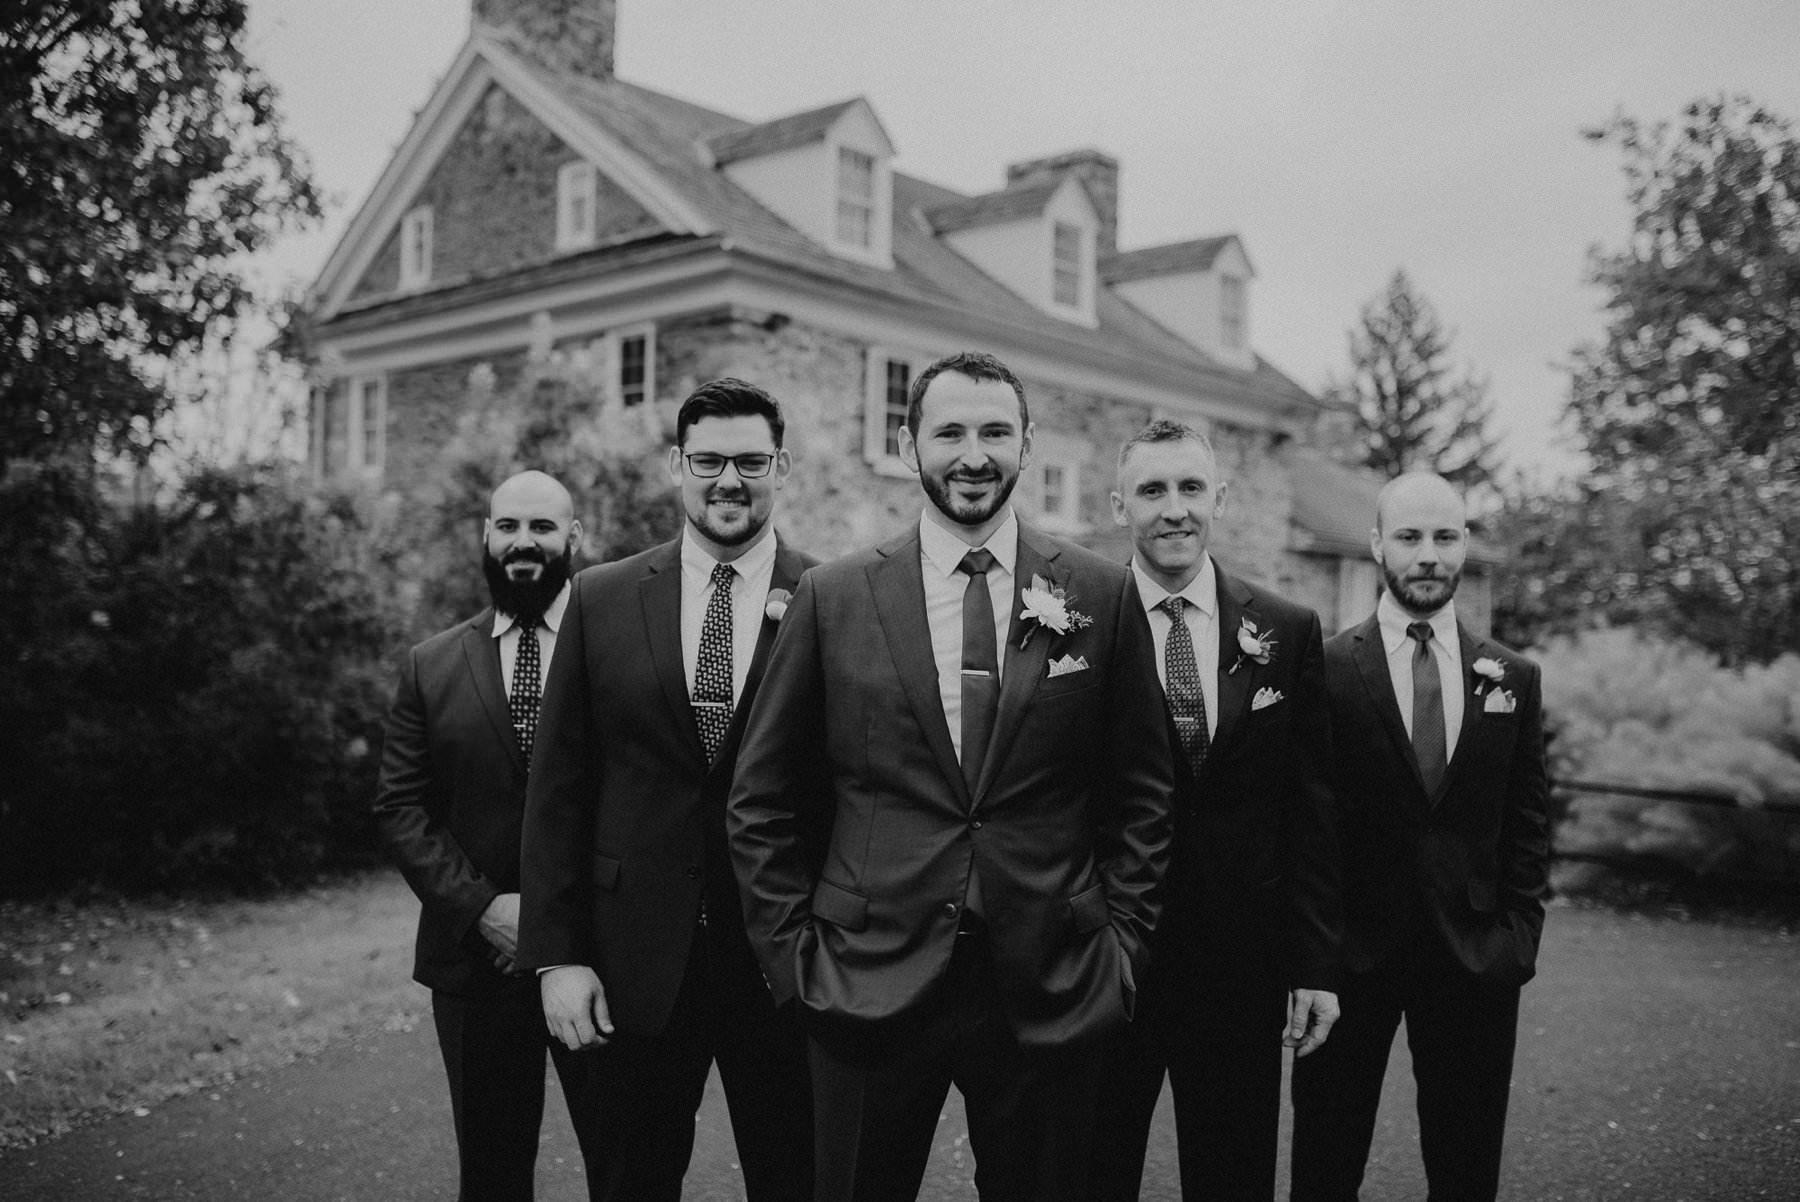 John_James_Audubon_Center_wedding-28.jpg